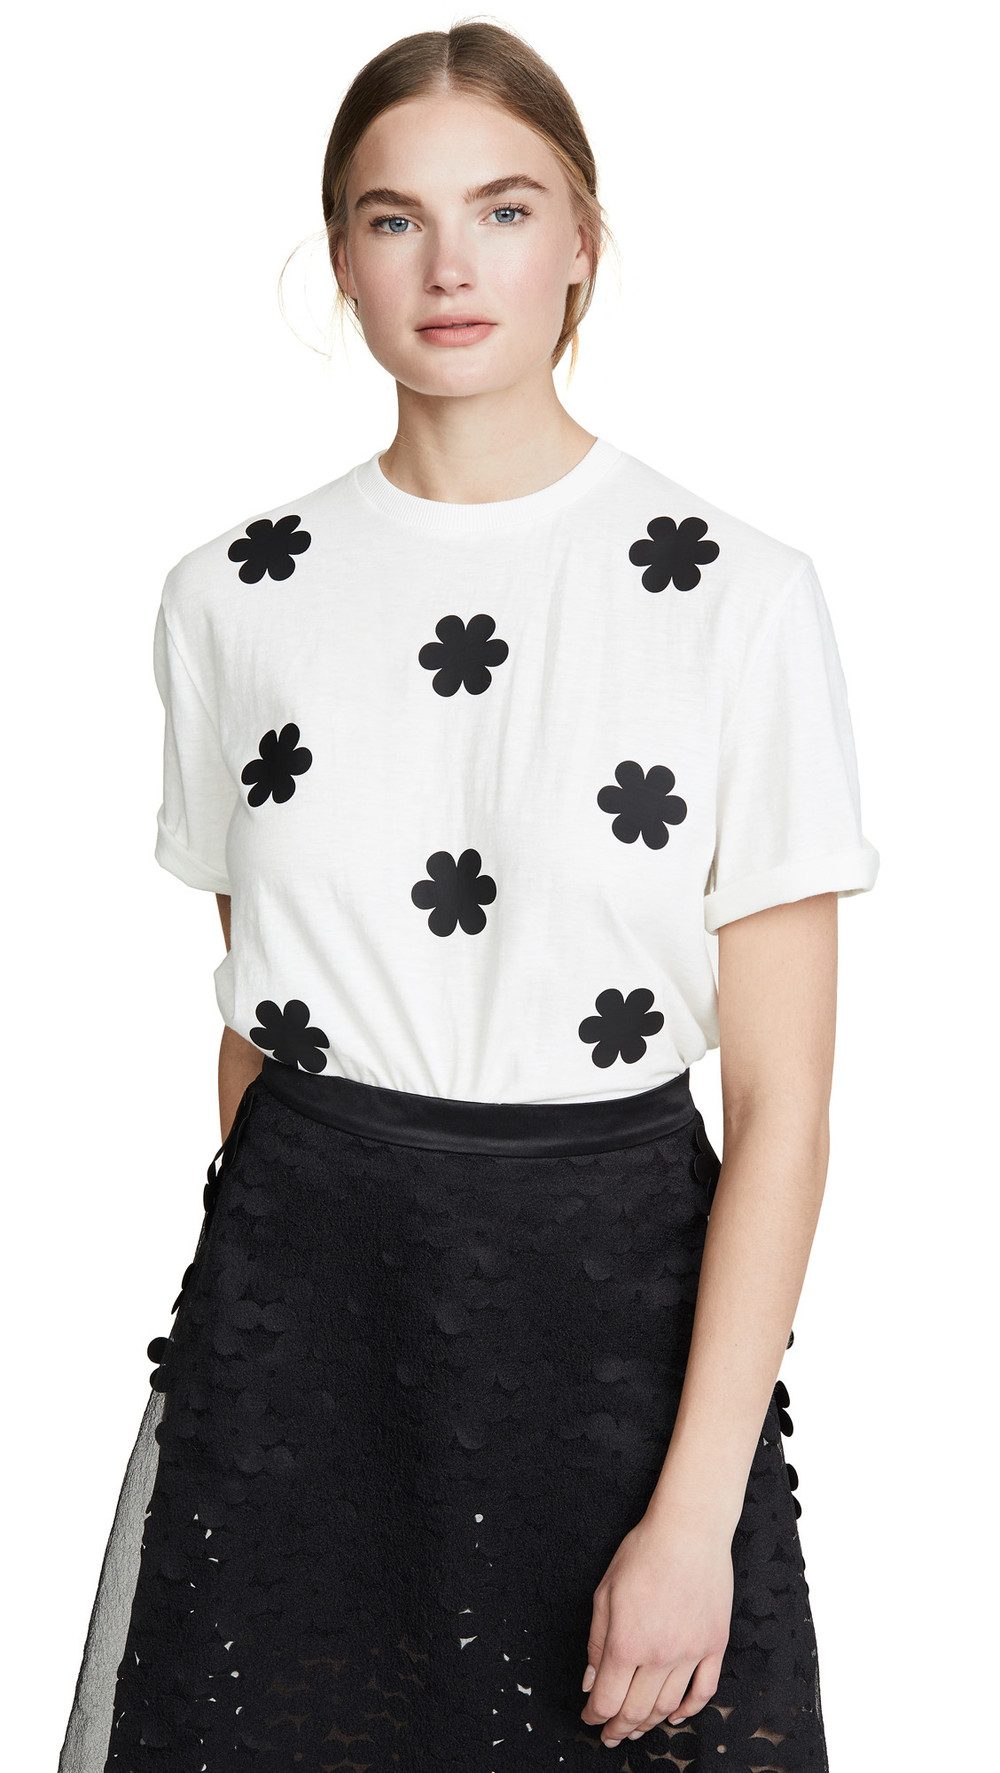 Paskal Floral T-shirt in black / white